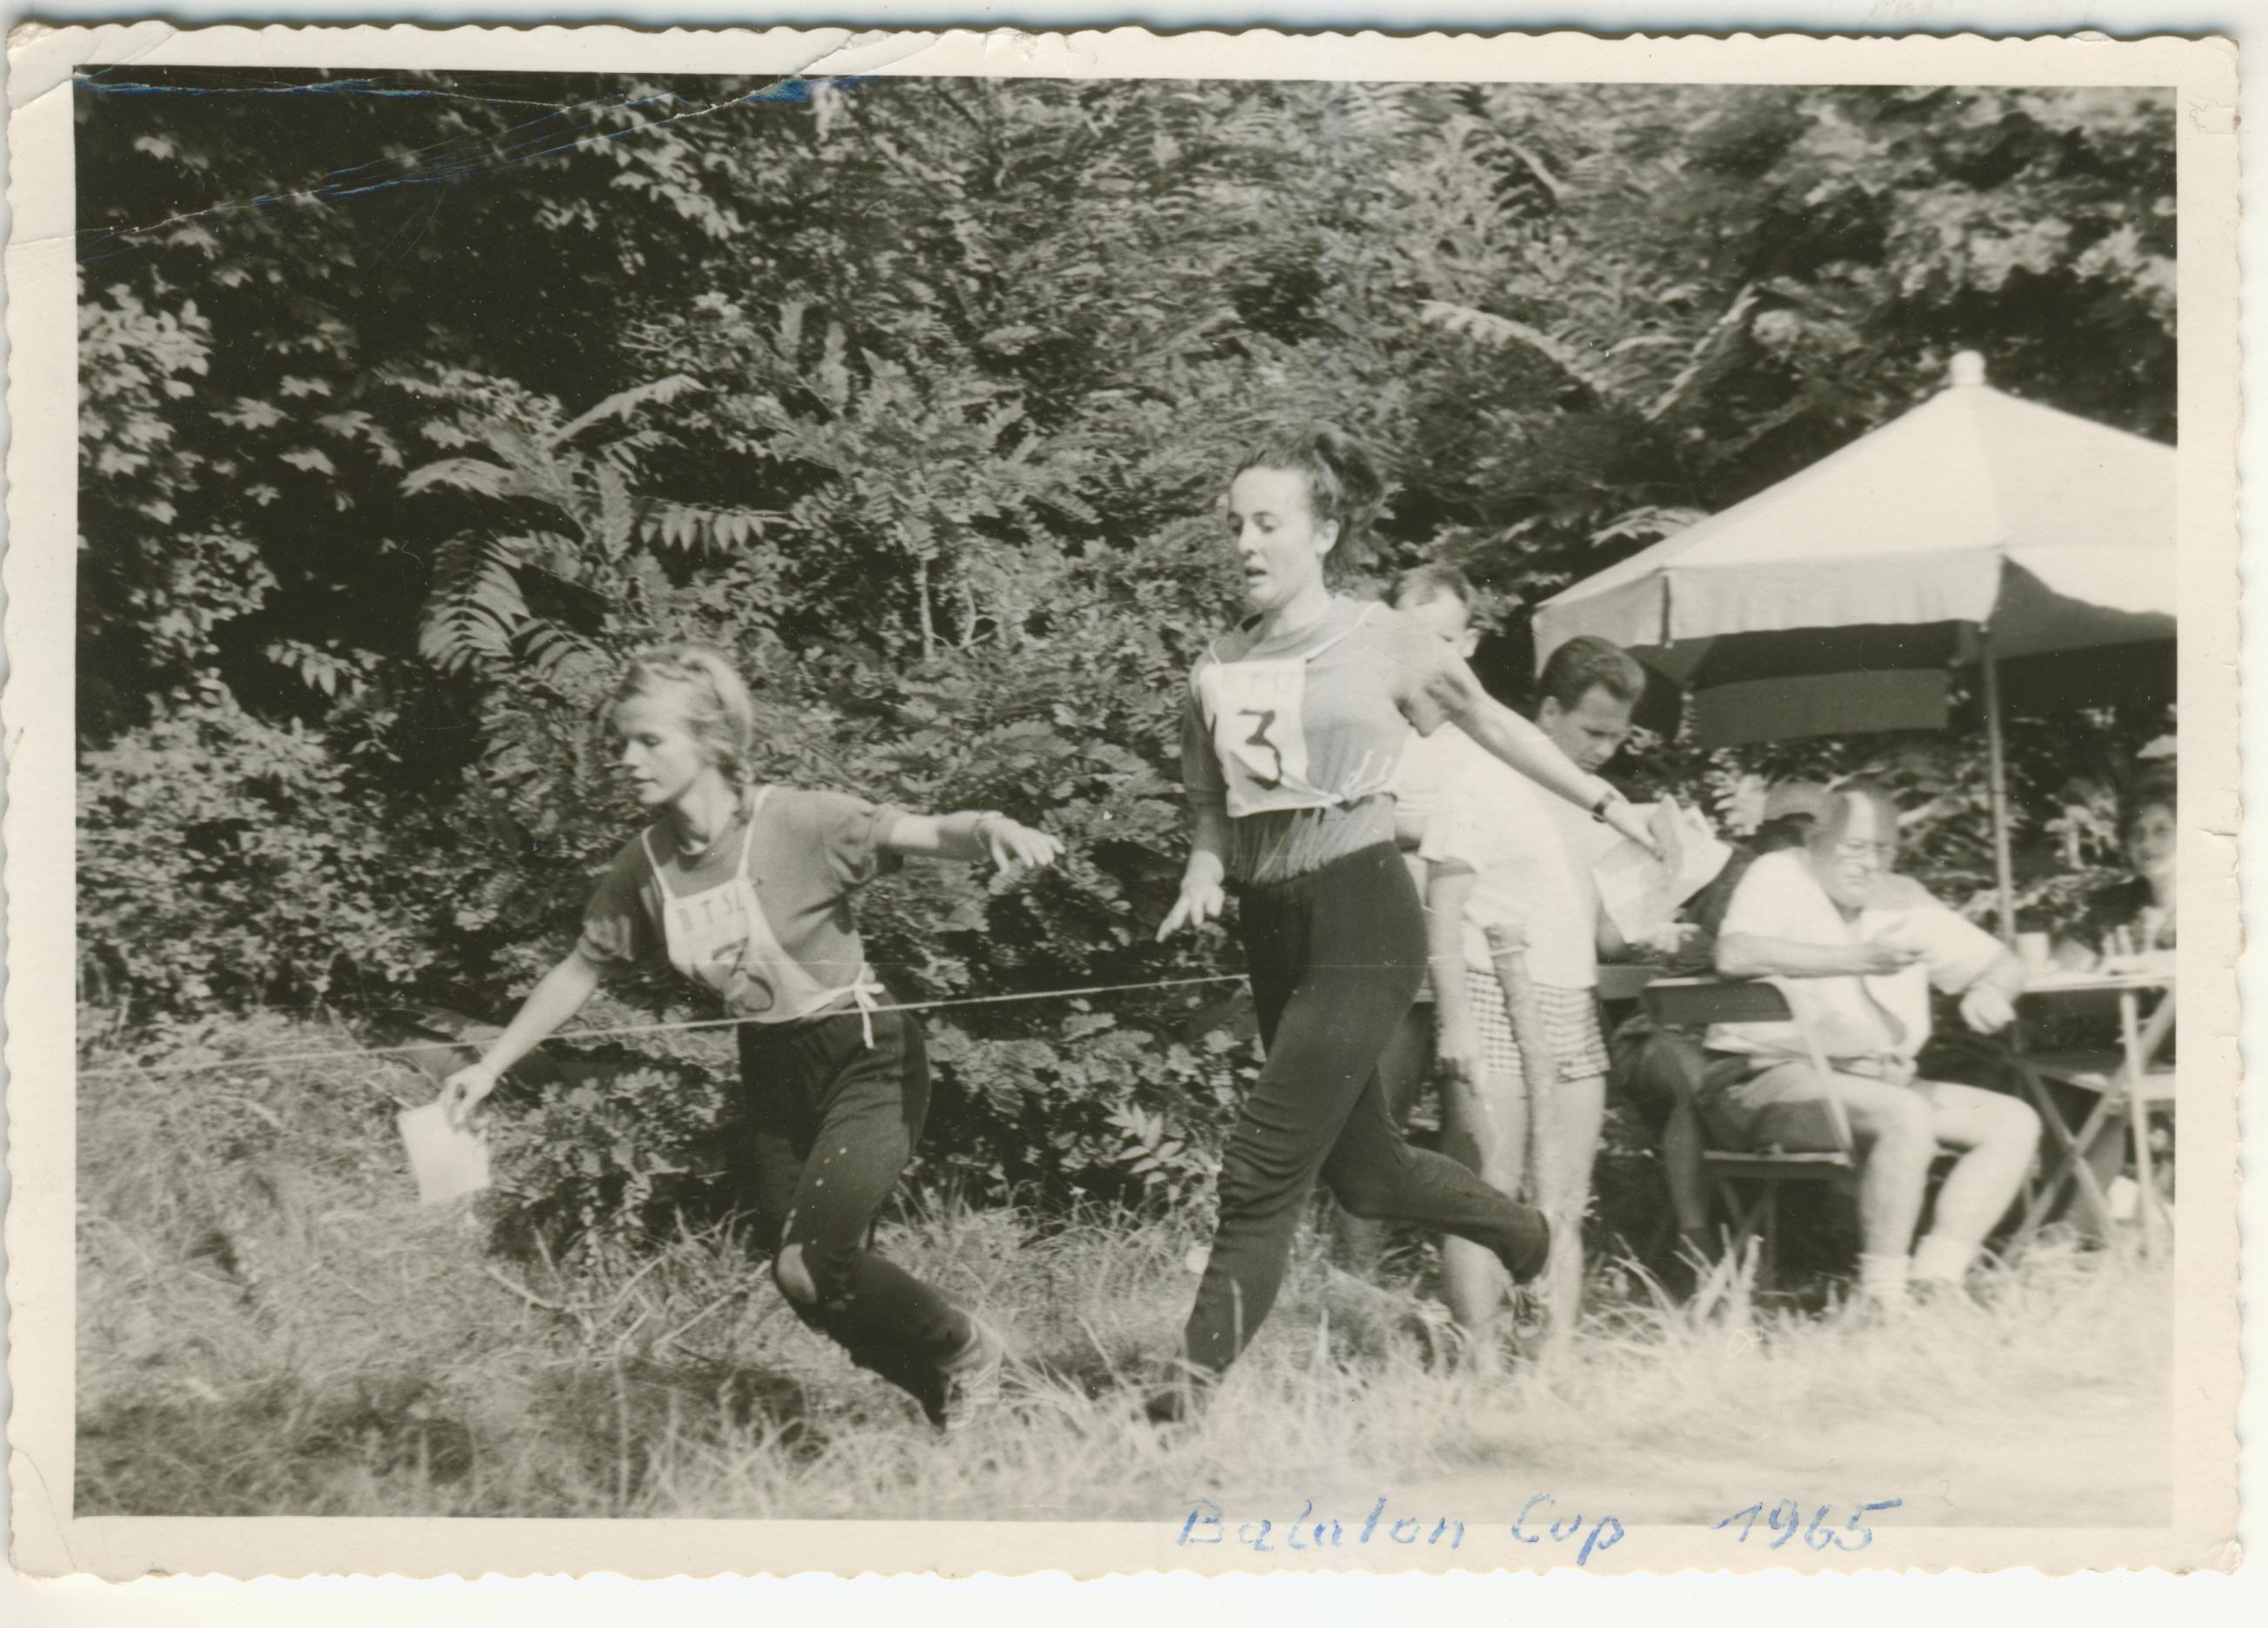 1965_08_nk_balaton_kupa_valto.jpg